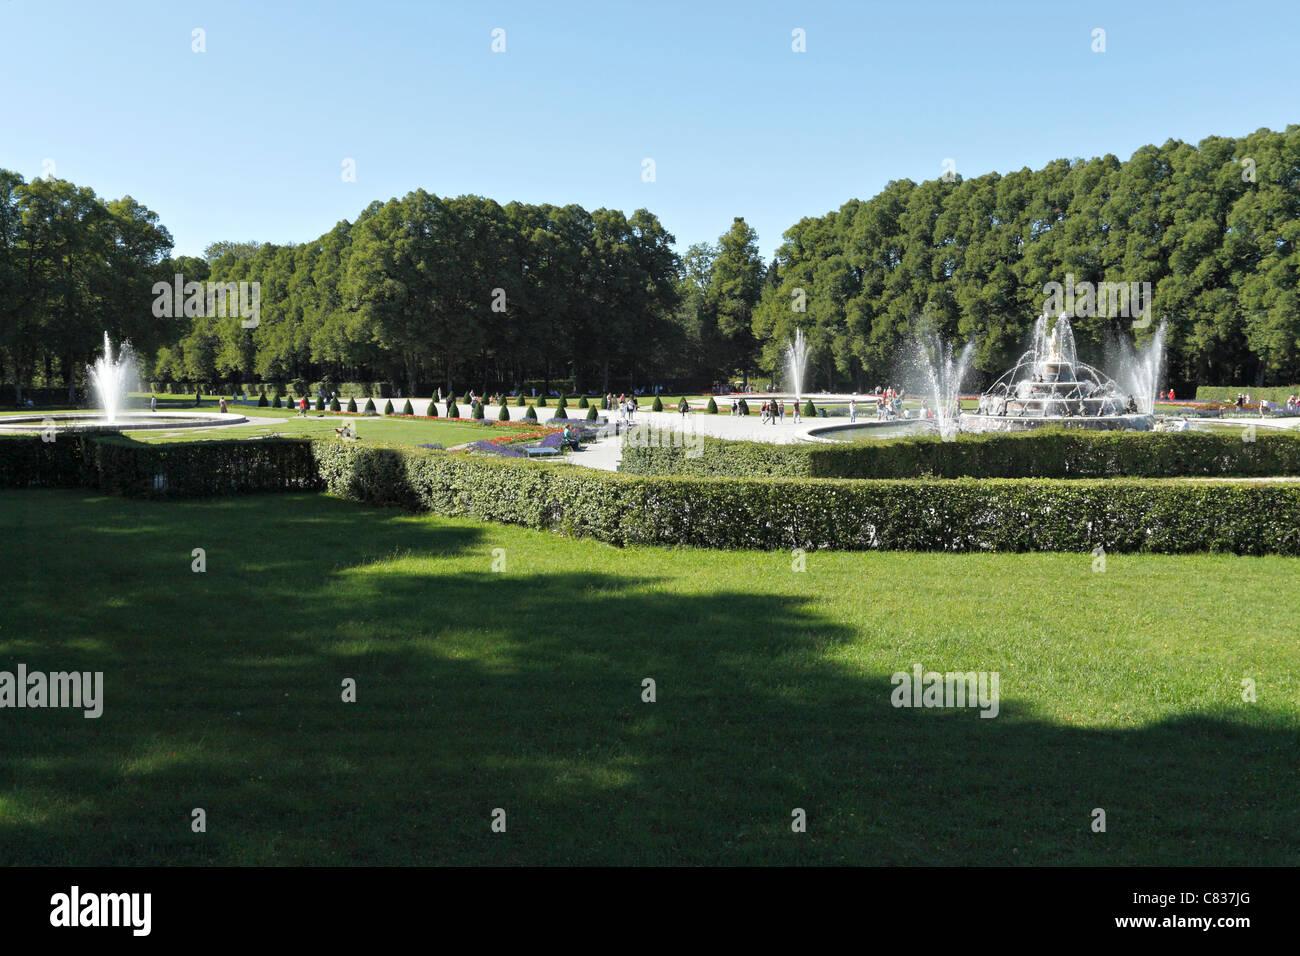 Herrechiemsee Schloss Palace Garden, Herreninsel Chiemgau Upper Bavaria Germany - Stock Image